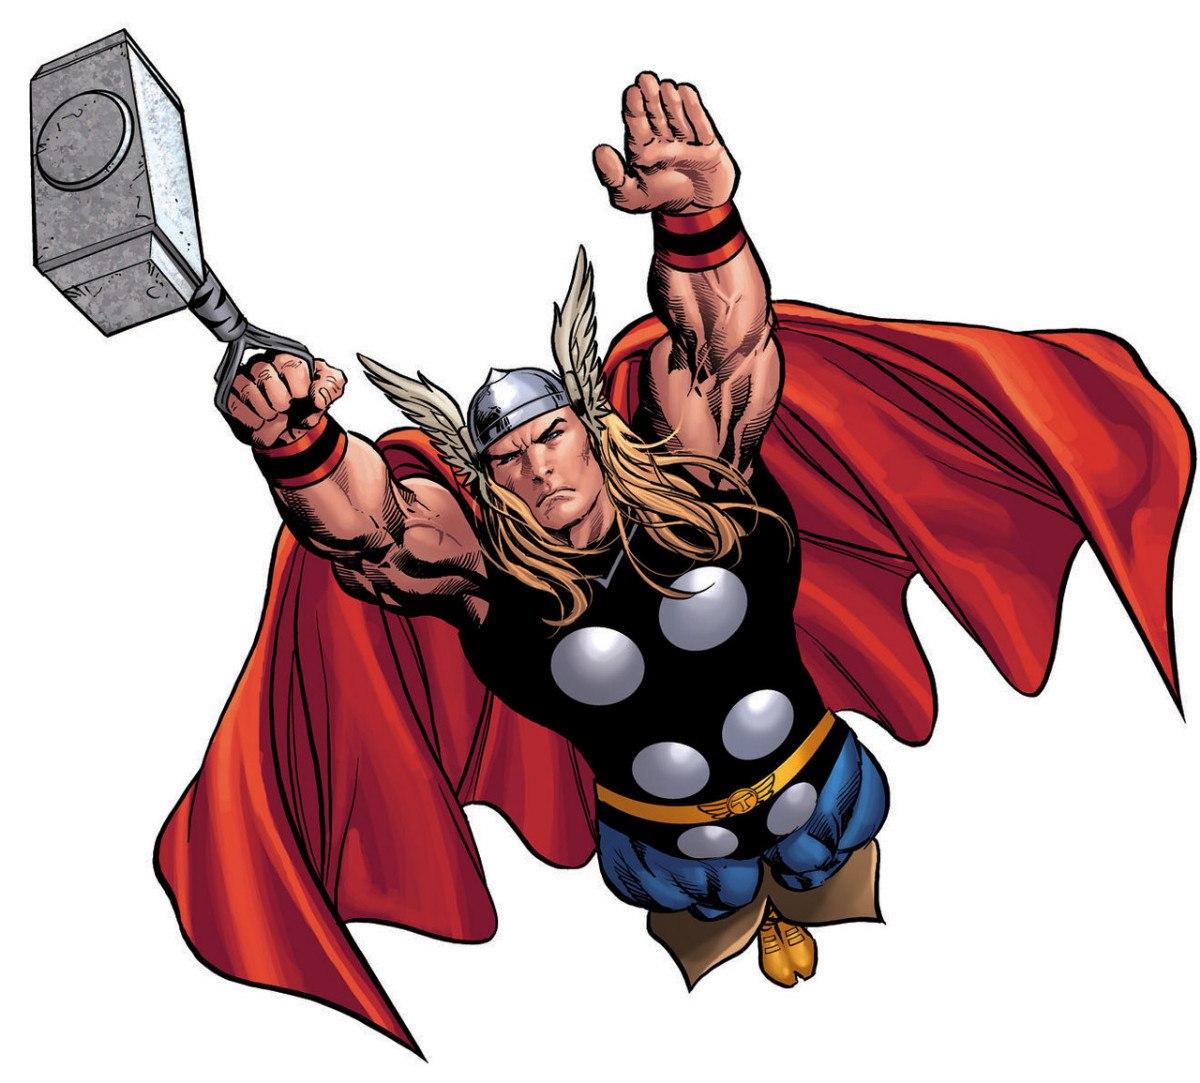 Fiesta de Halloween [EVENTO GRUPAL] Marvel-legends-thor-20-cm-spiderman-x-men-avengers-batman-dc-752-MCO4711317789_072013-F